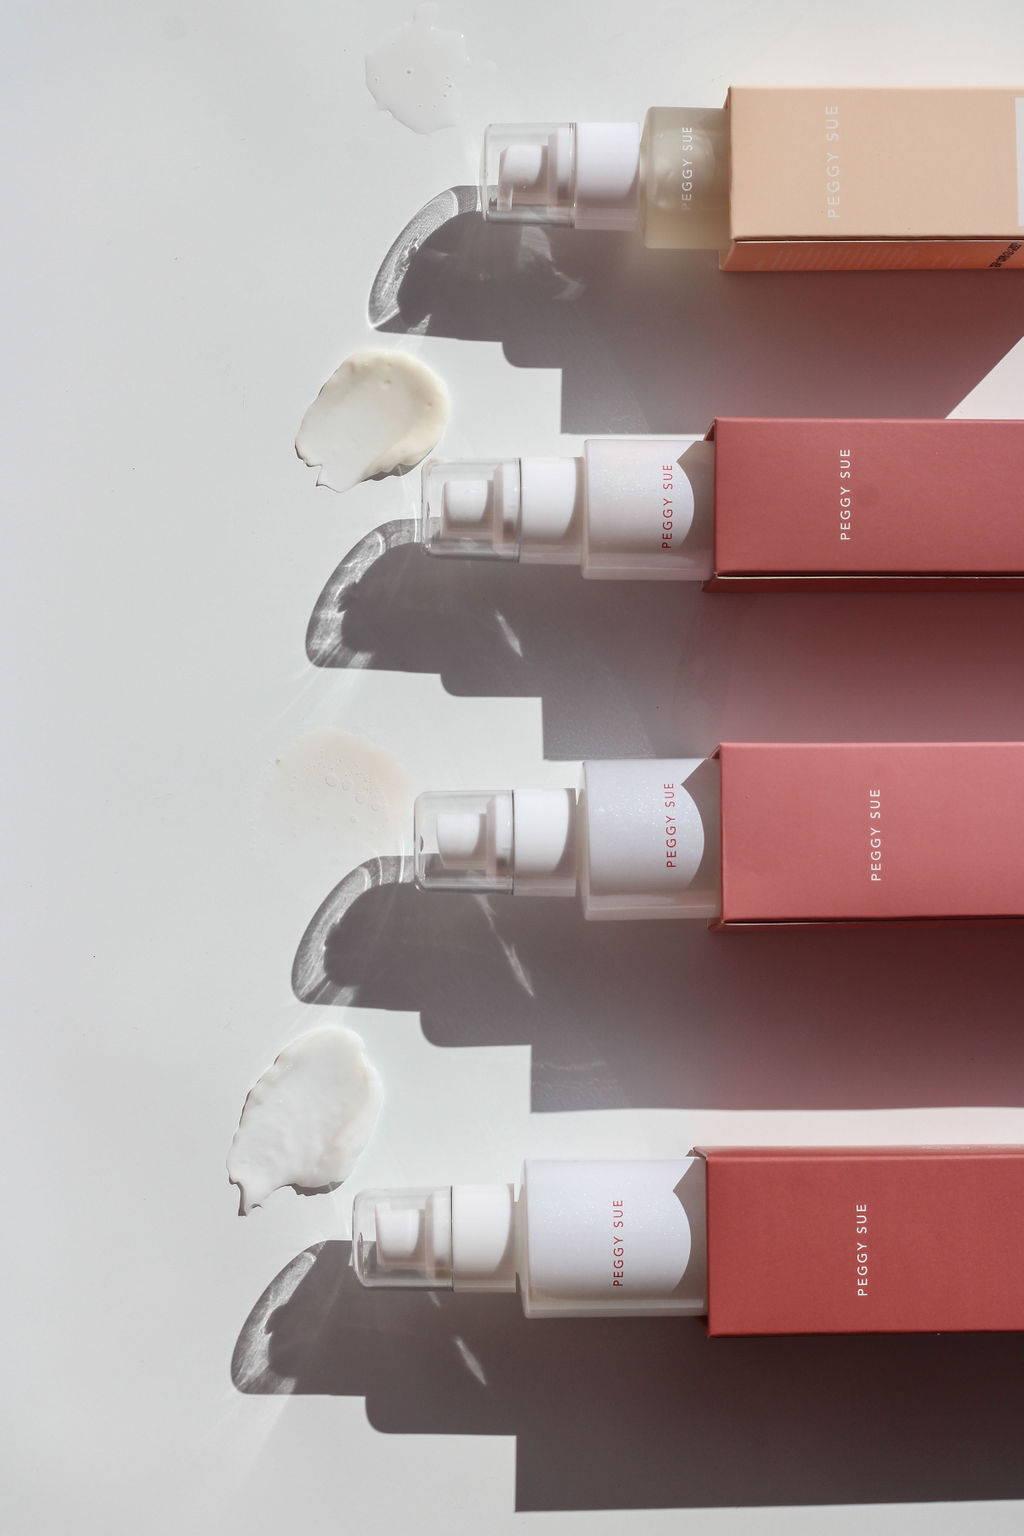 Product shot of moisturisers